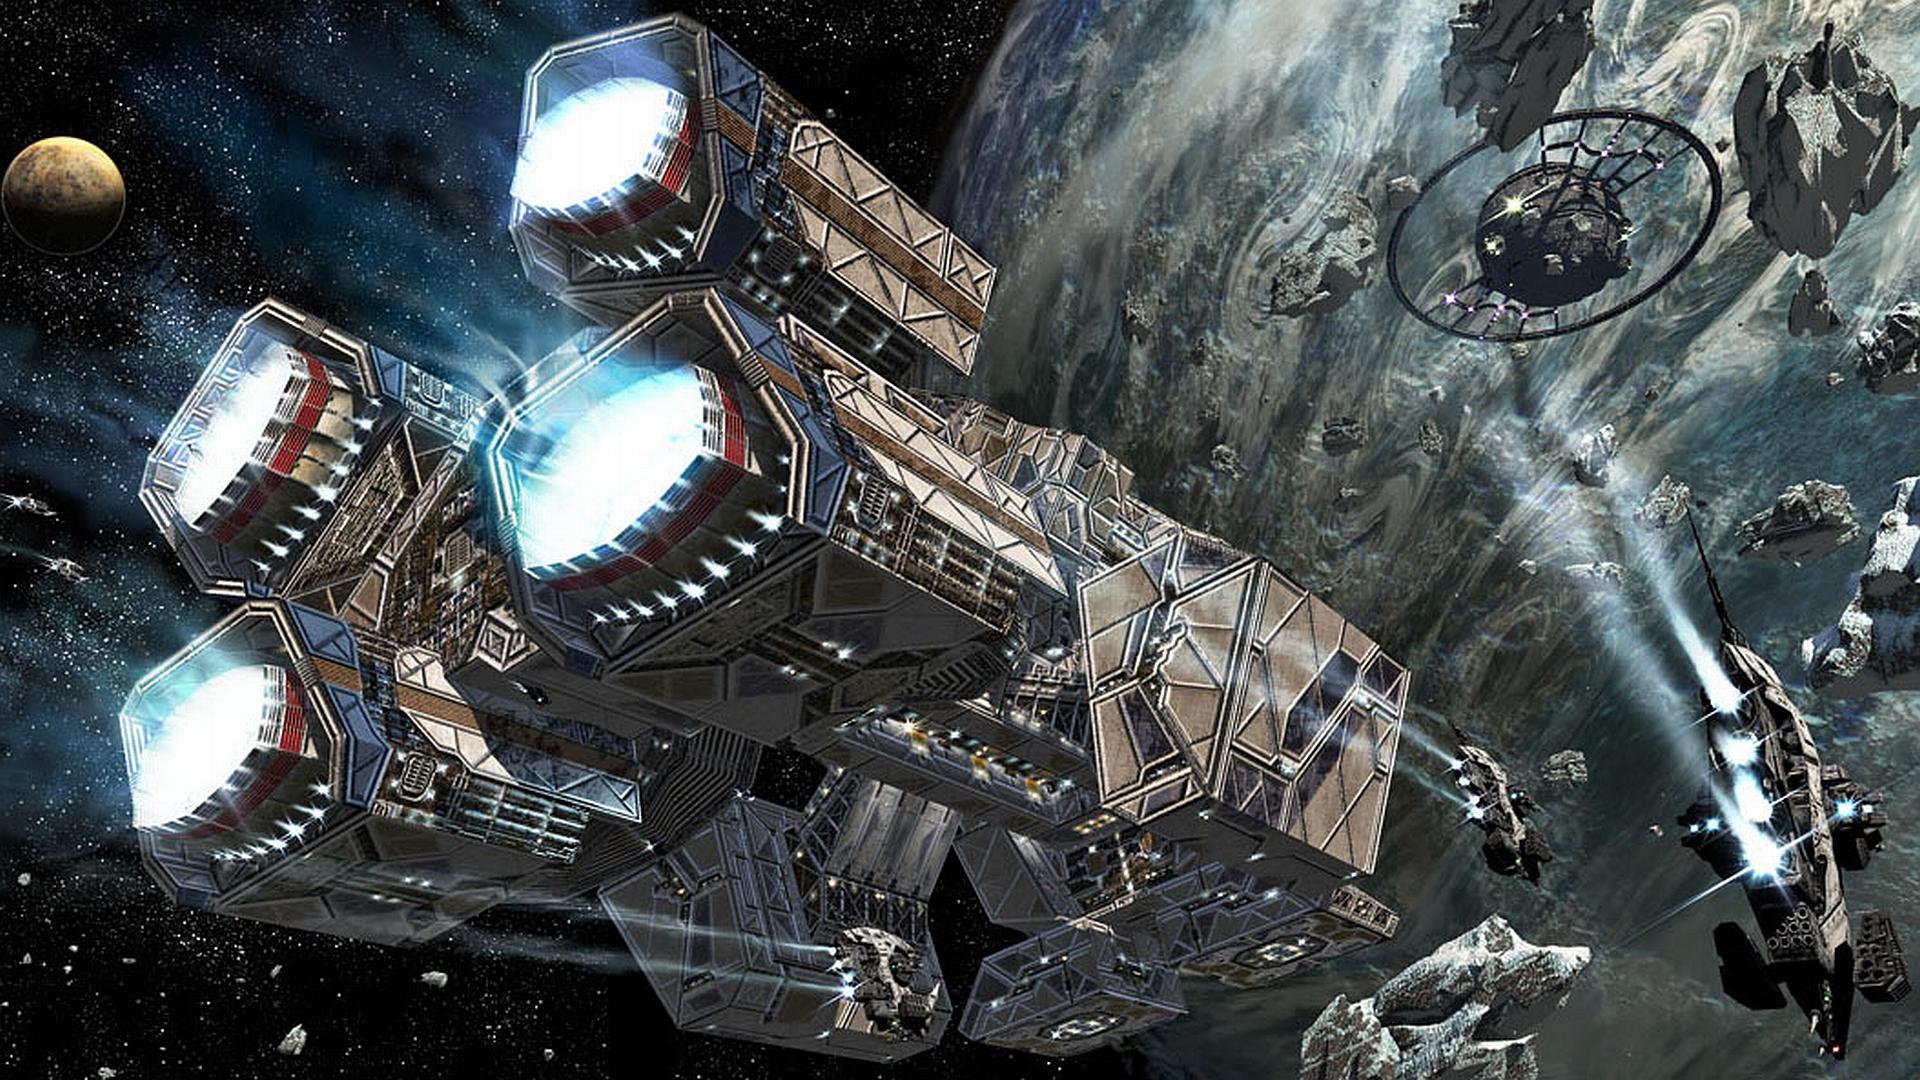 Картинки на рабочий стол фантастика космические корабли